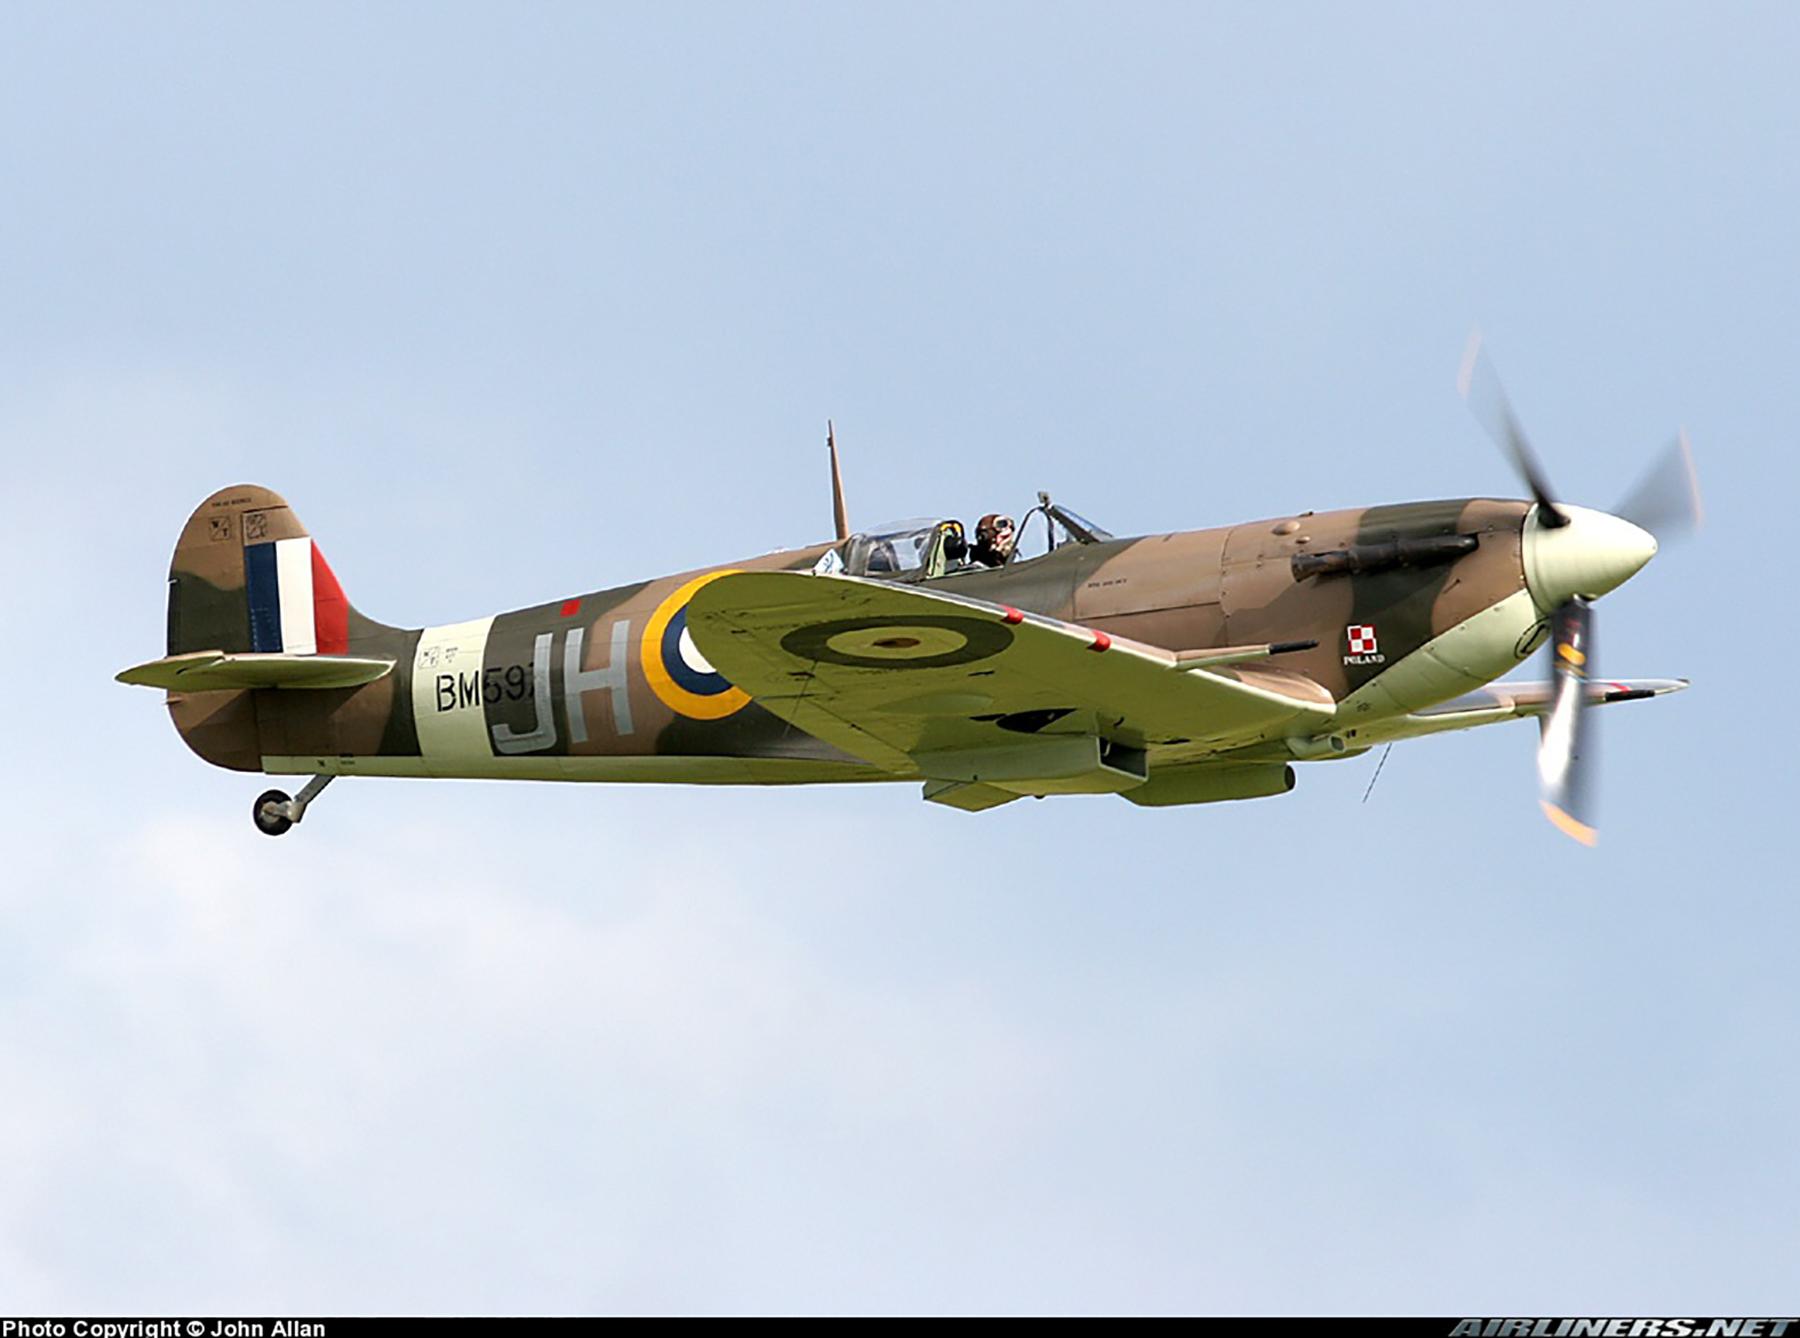 Airworthy Spitfire warbird MkVb RAF 317Sqn JHC BM597 G MKVB 17